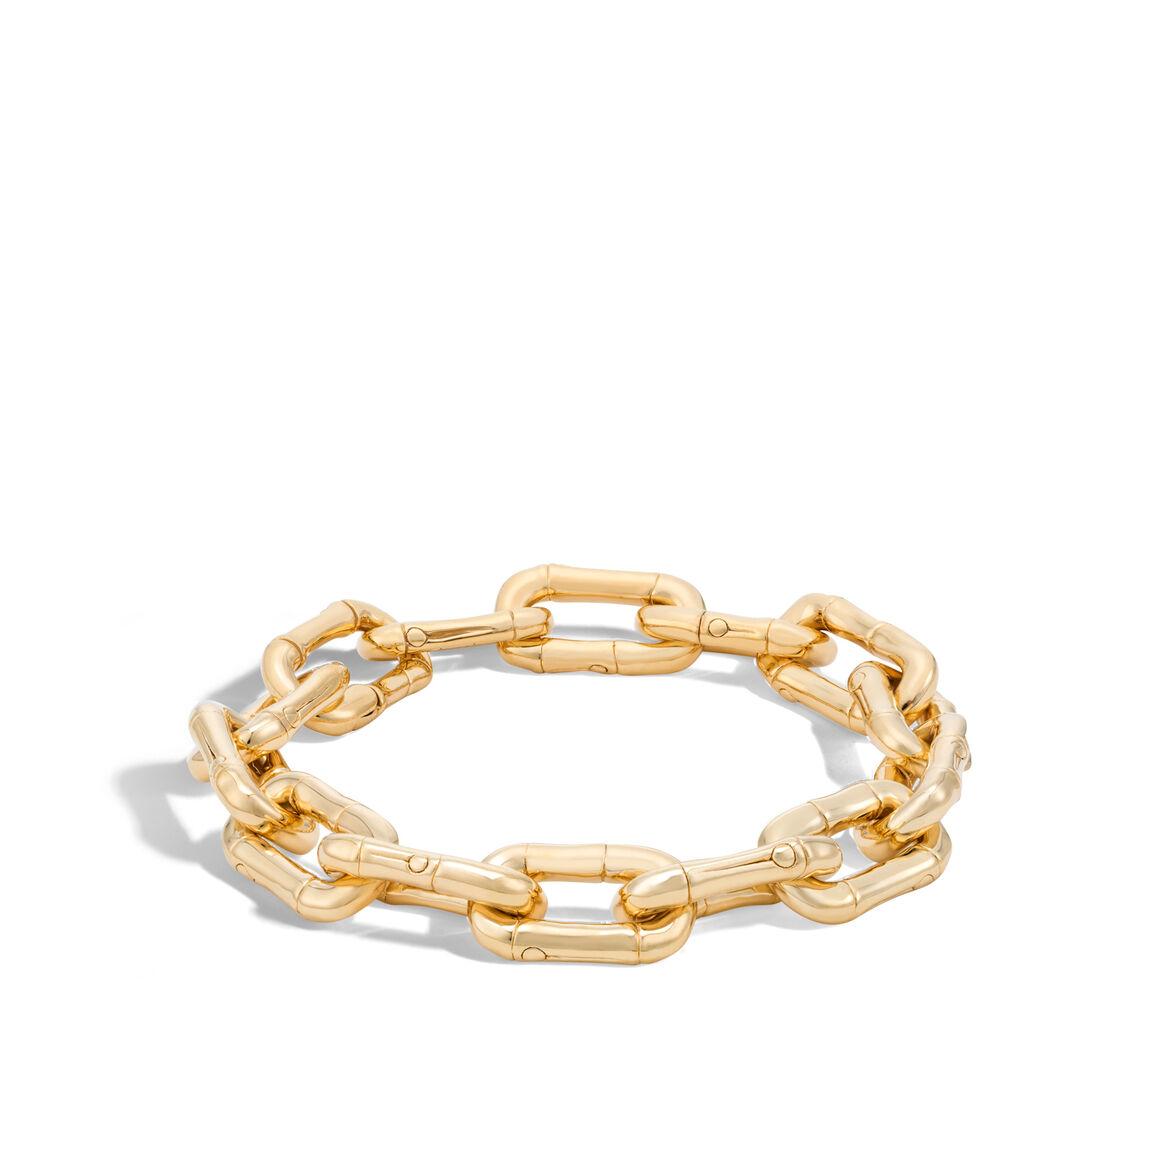 Bamboo Link Bracelet in 18K Gold